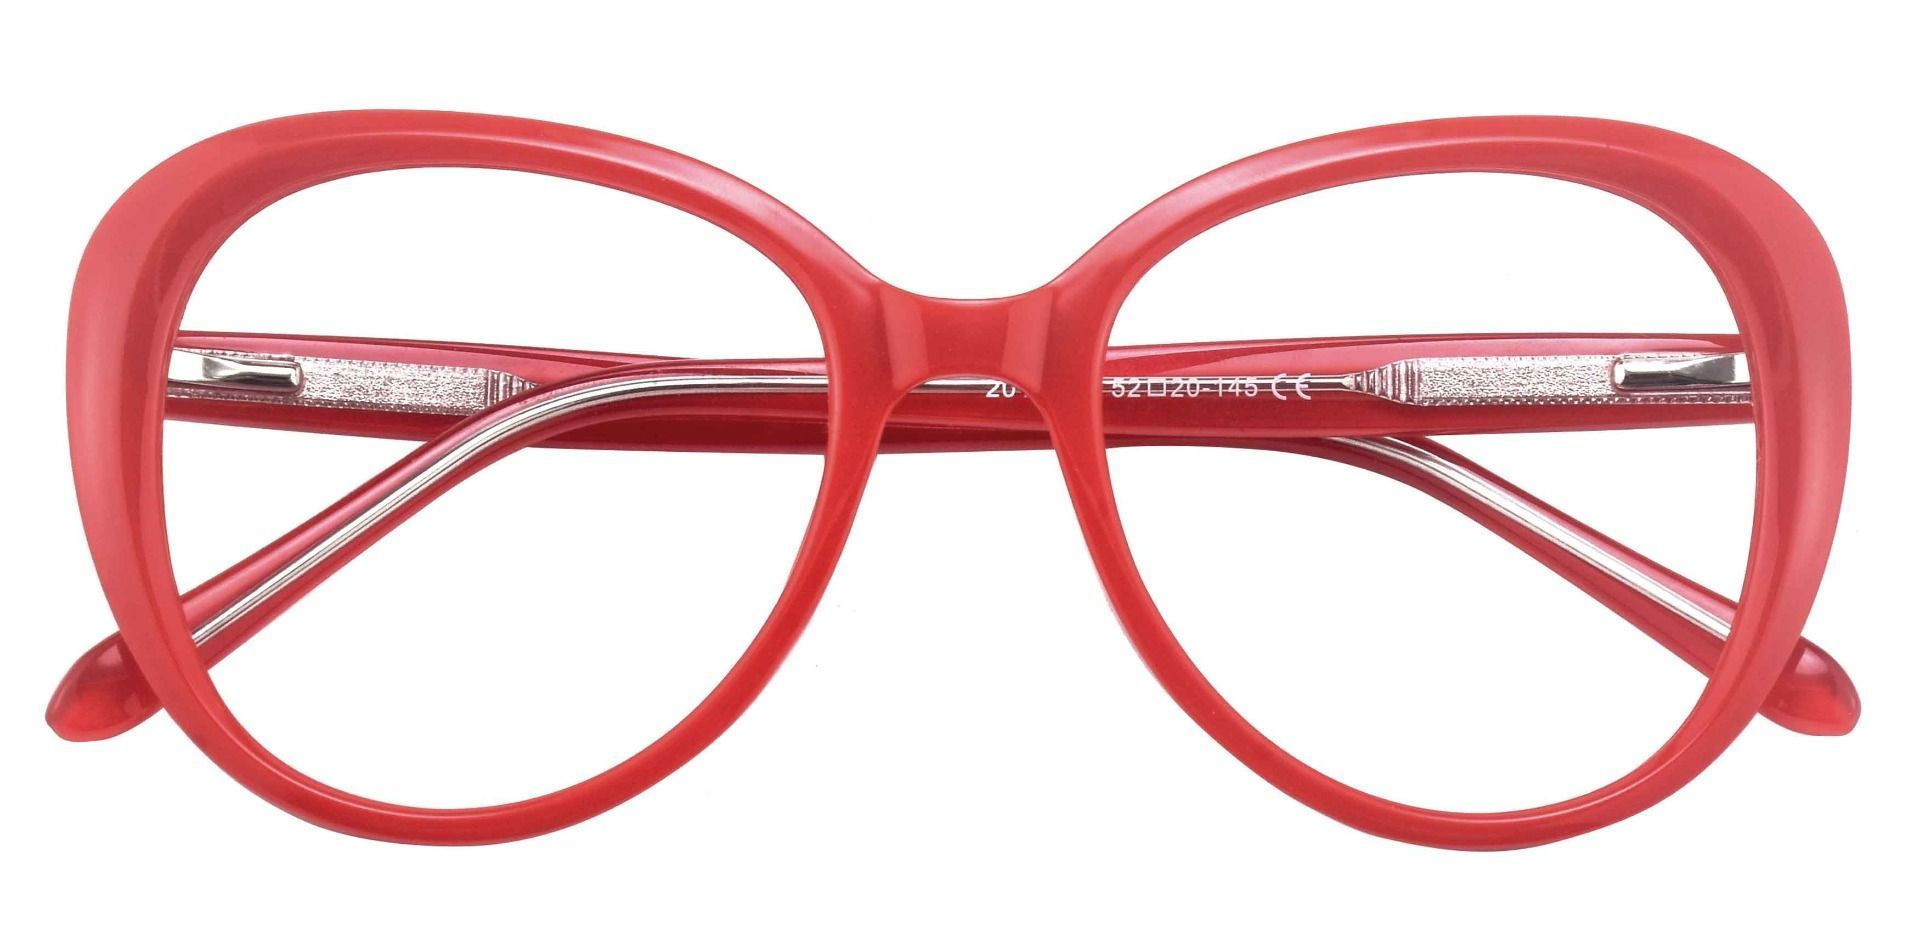 Sheridan Oval Prescription Glasses - Red